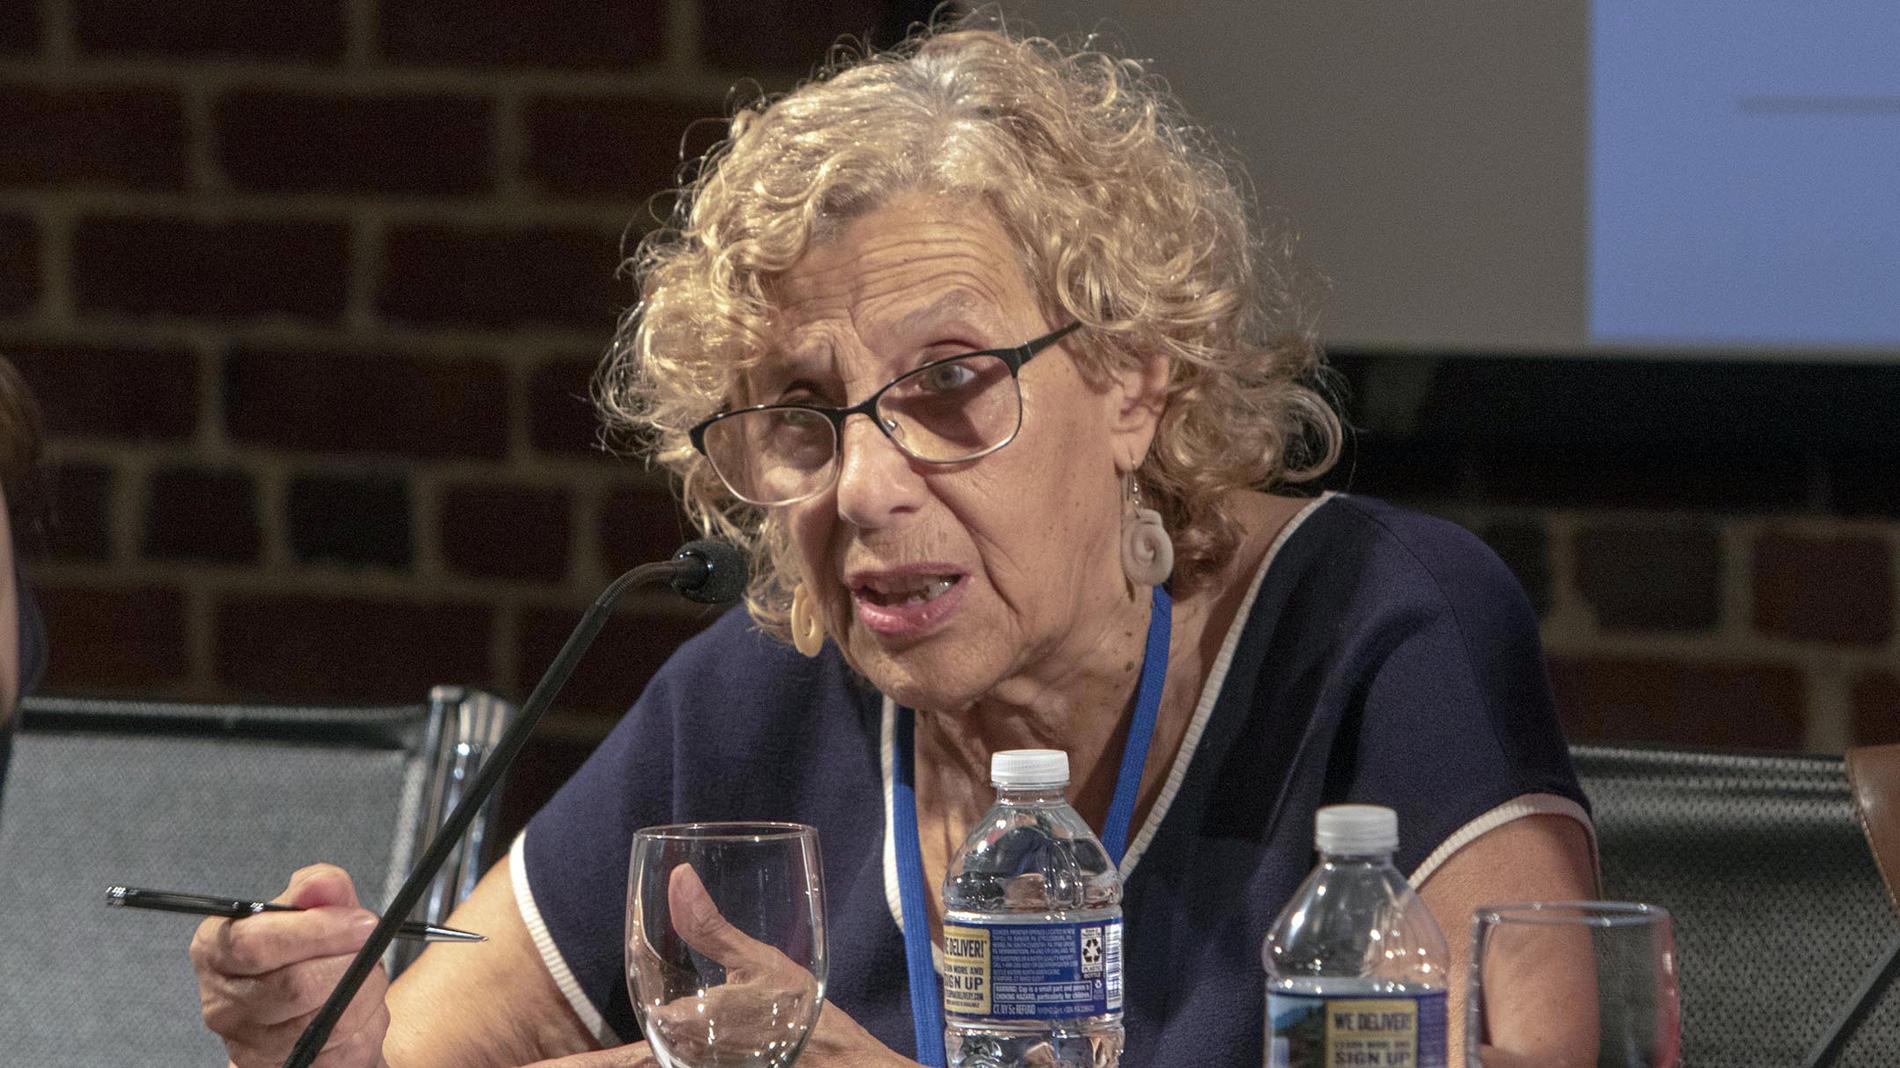 Ir al VideoLa alcaldesa de Madrid, Manuela Carmena, está cada vez más cerca de buscar un segundo mandato